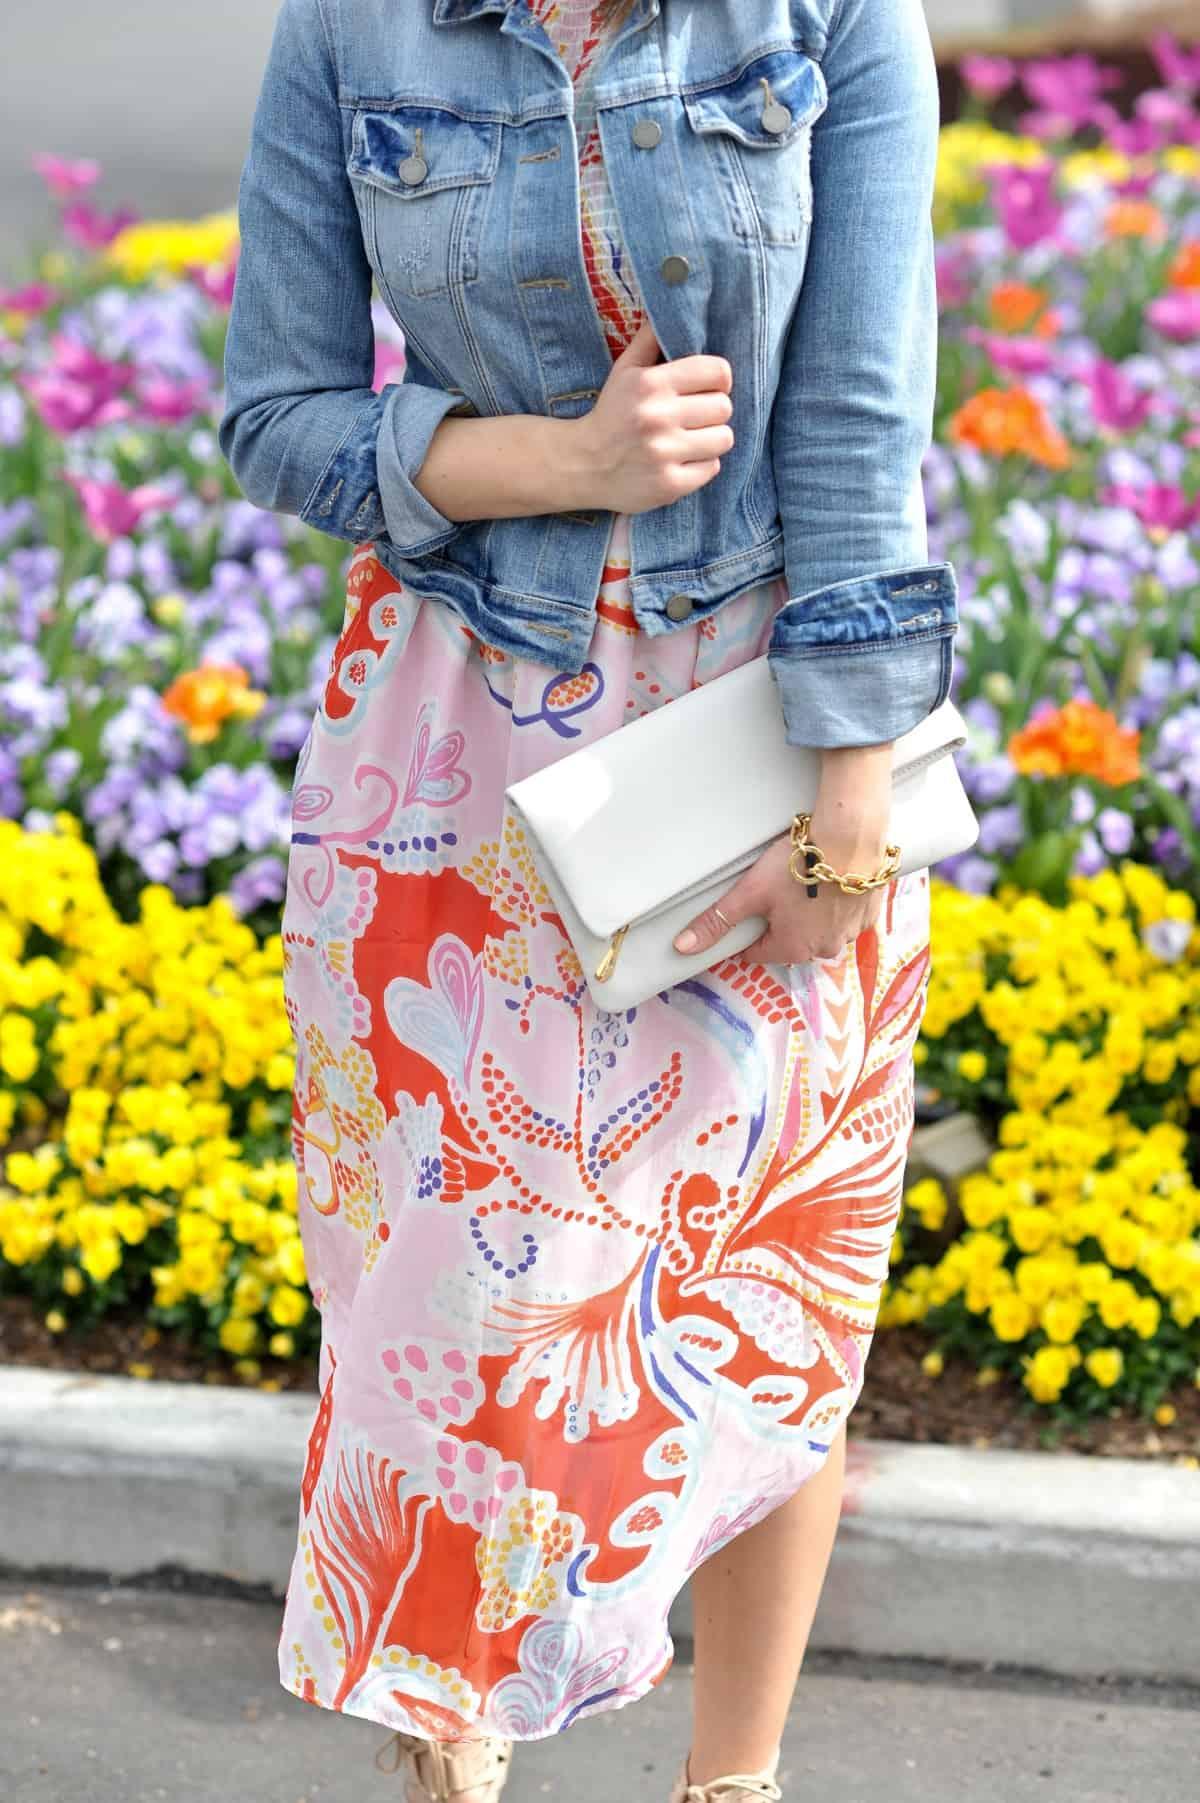 Banjanan Cochella Dress - printed floral dress for summer - My Style Vita - @mystylevita - 11